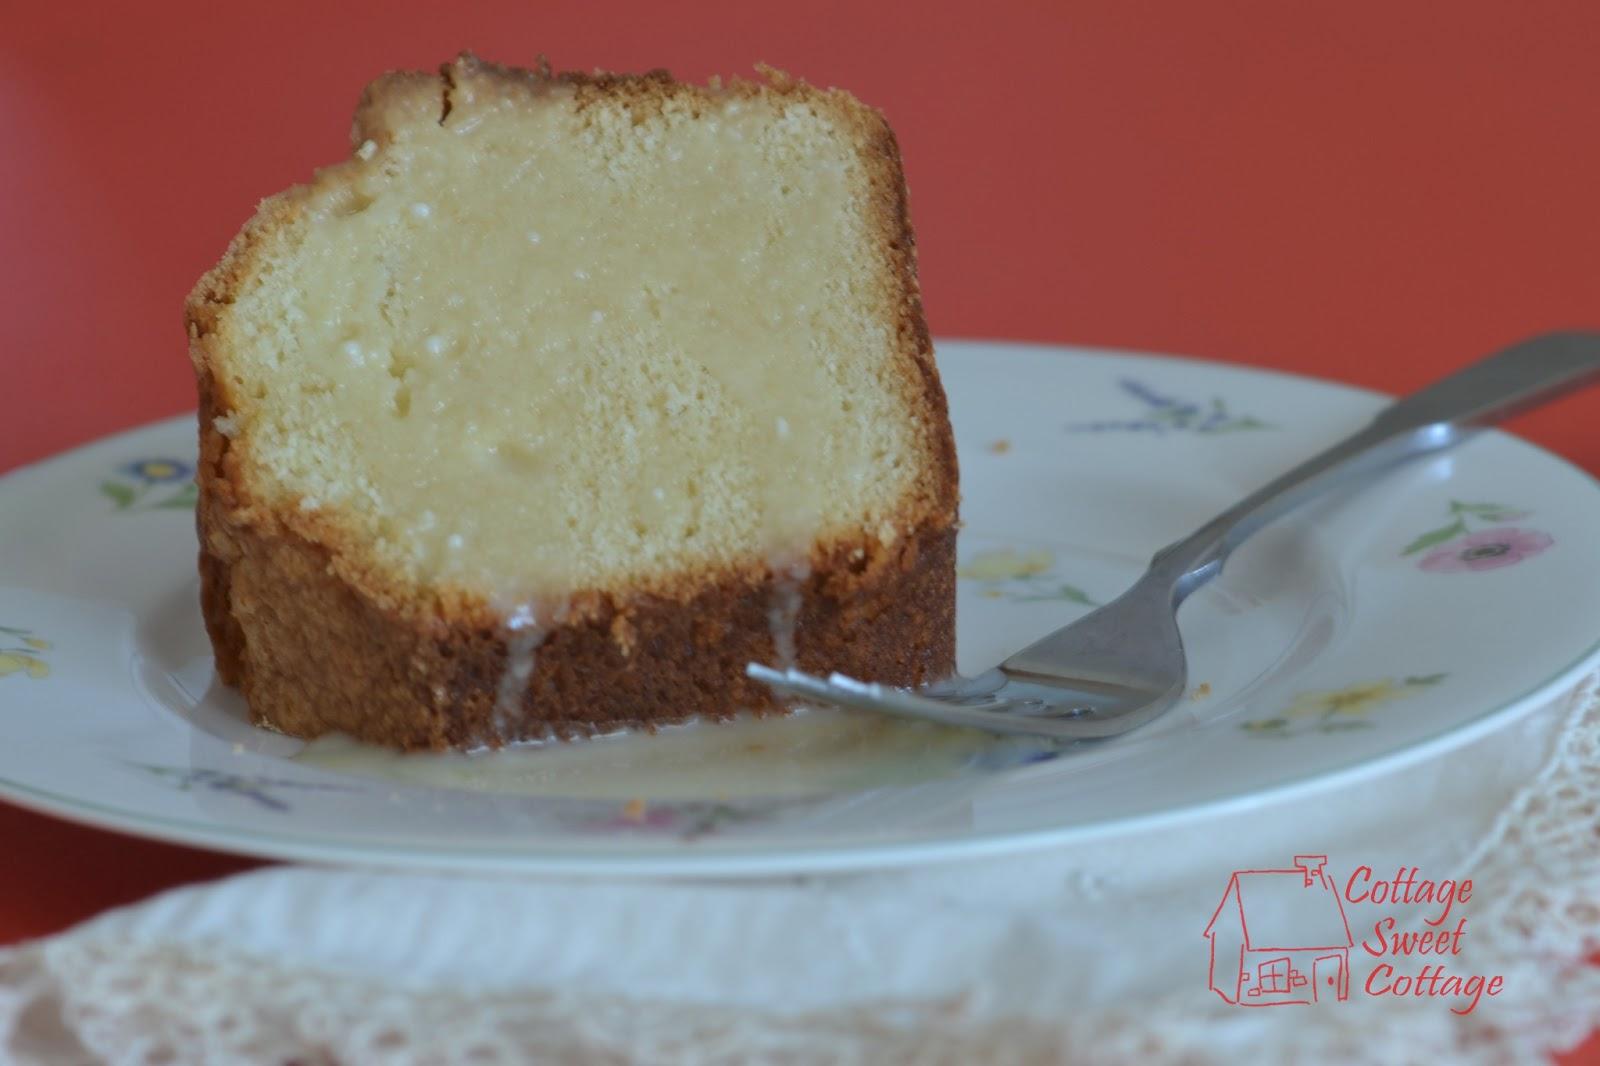 coconut cake orange coconut cake iii slice+ creamy coconut cake